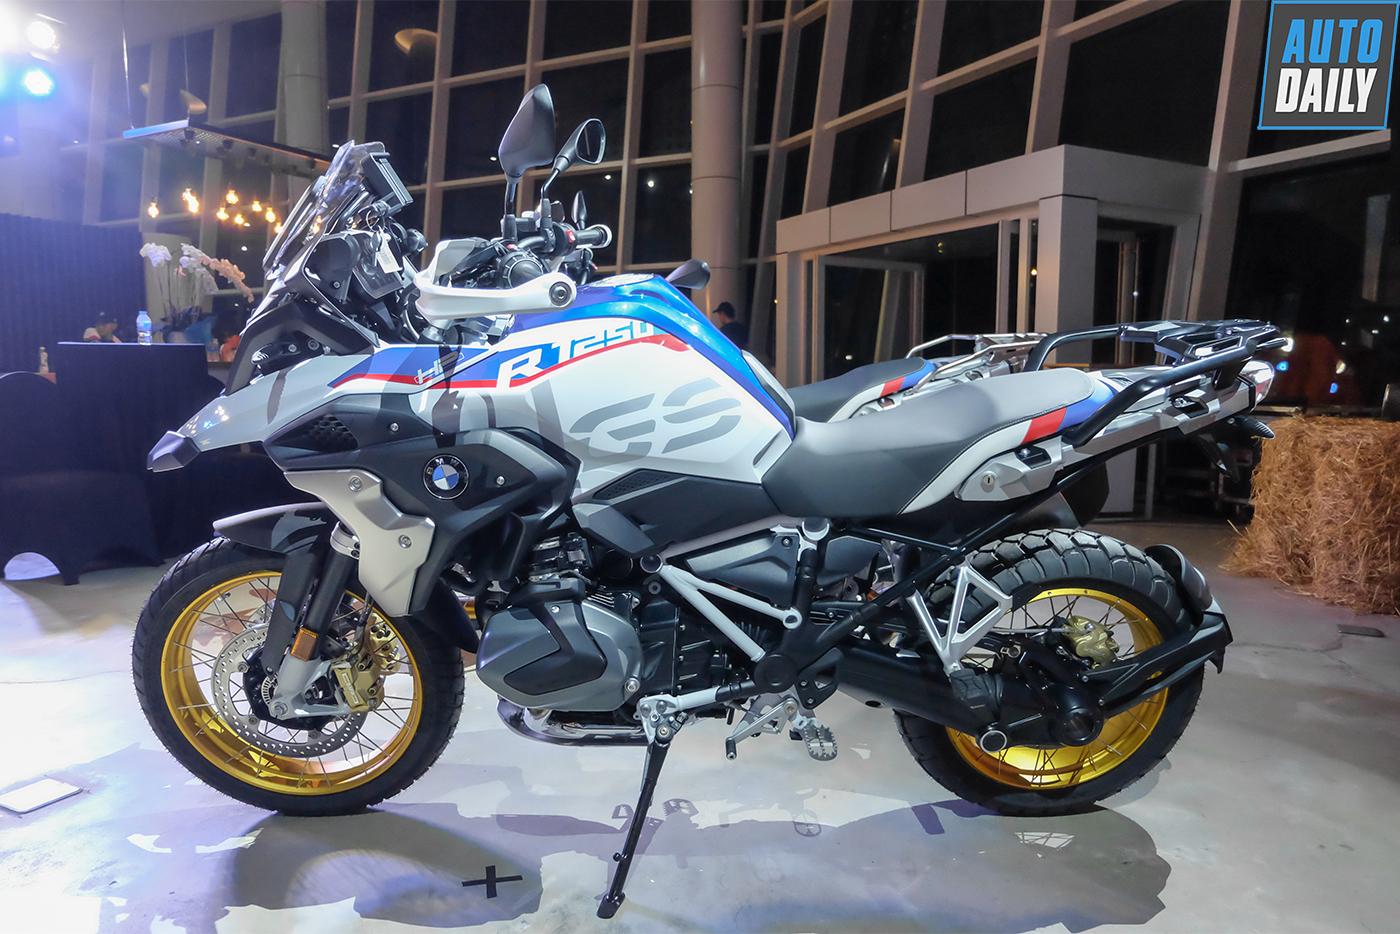 bmw-motorrad-r-1250-gs-2019-6.jpg